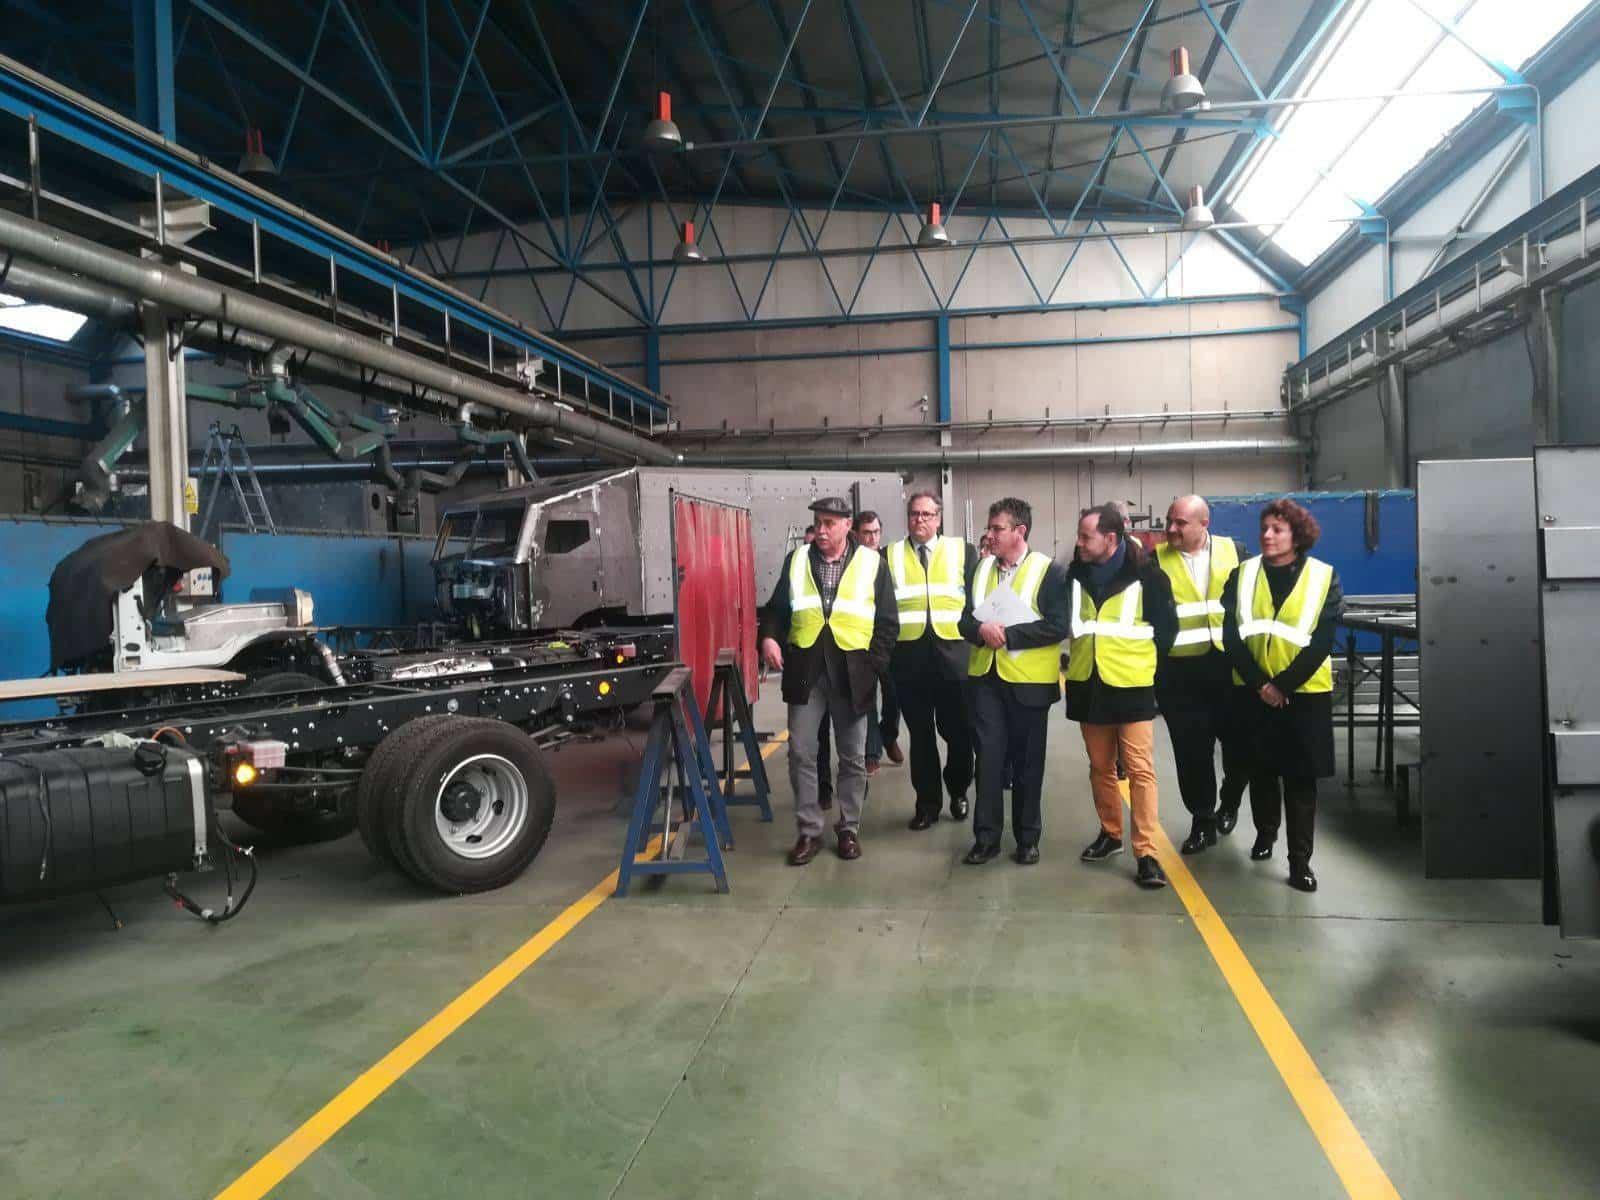 Director General de Empleo visitó TSD-DIVISEGUR en Herencia 6